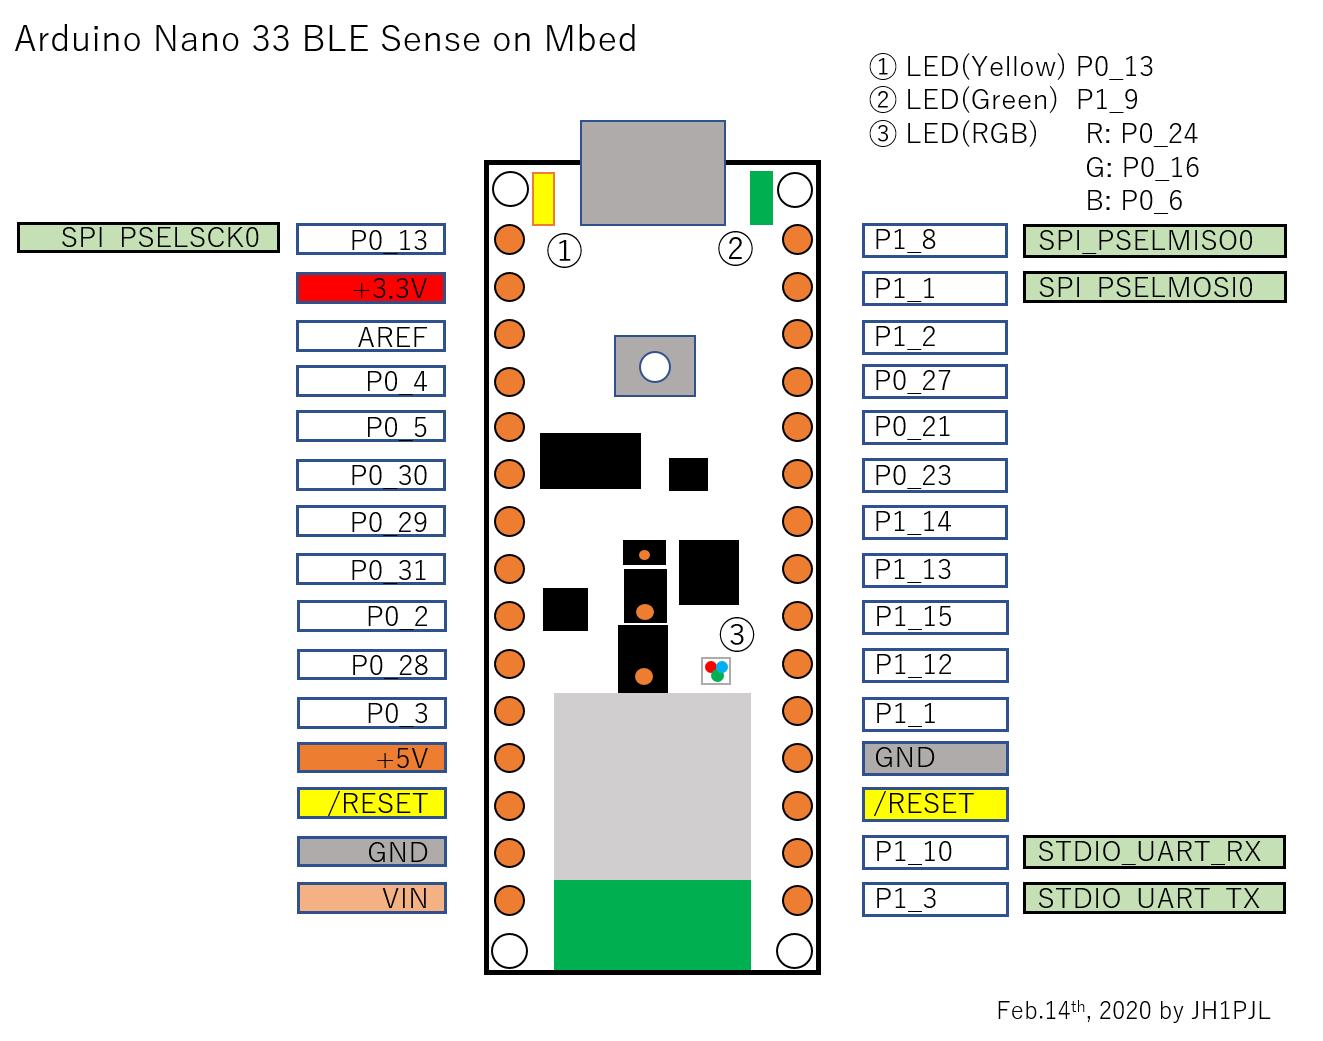 https://os.mbed.com/media/uploads/kenjiArai/nano33ble_pin.png